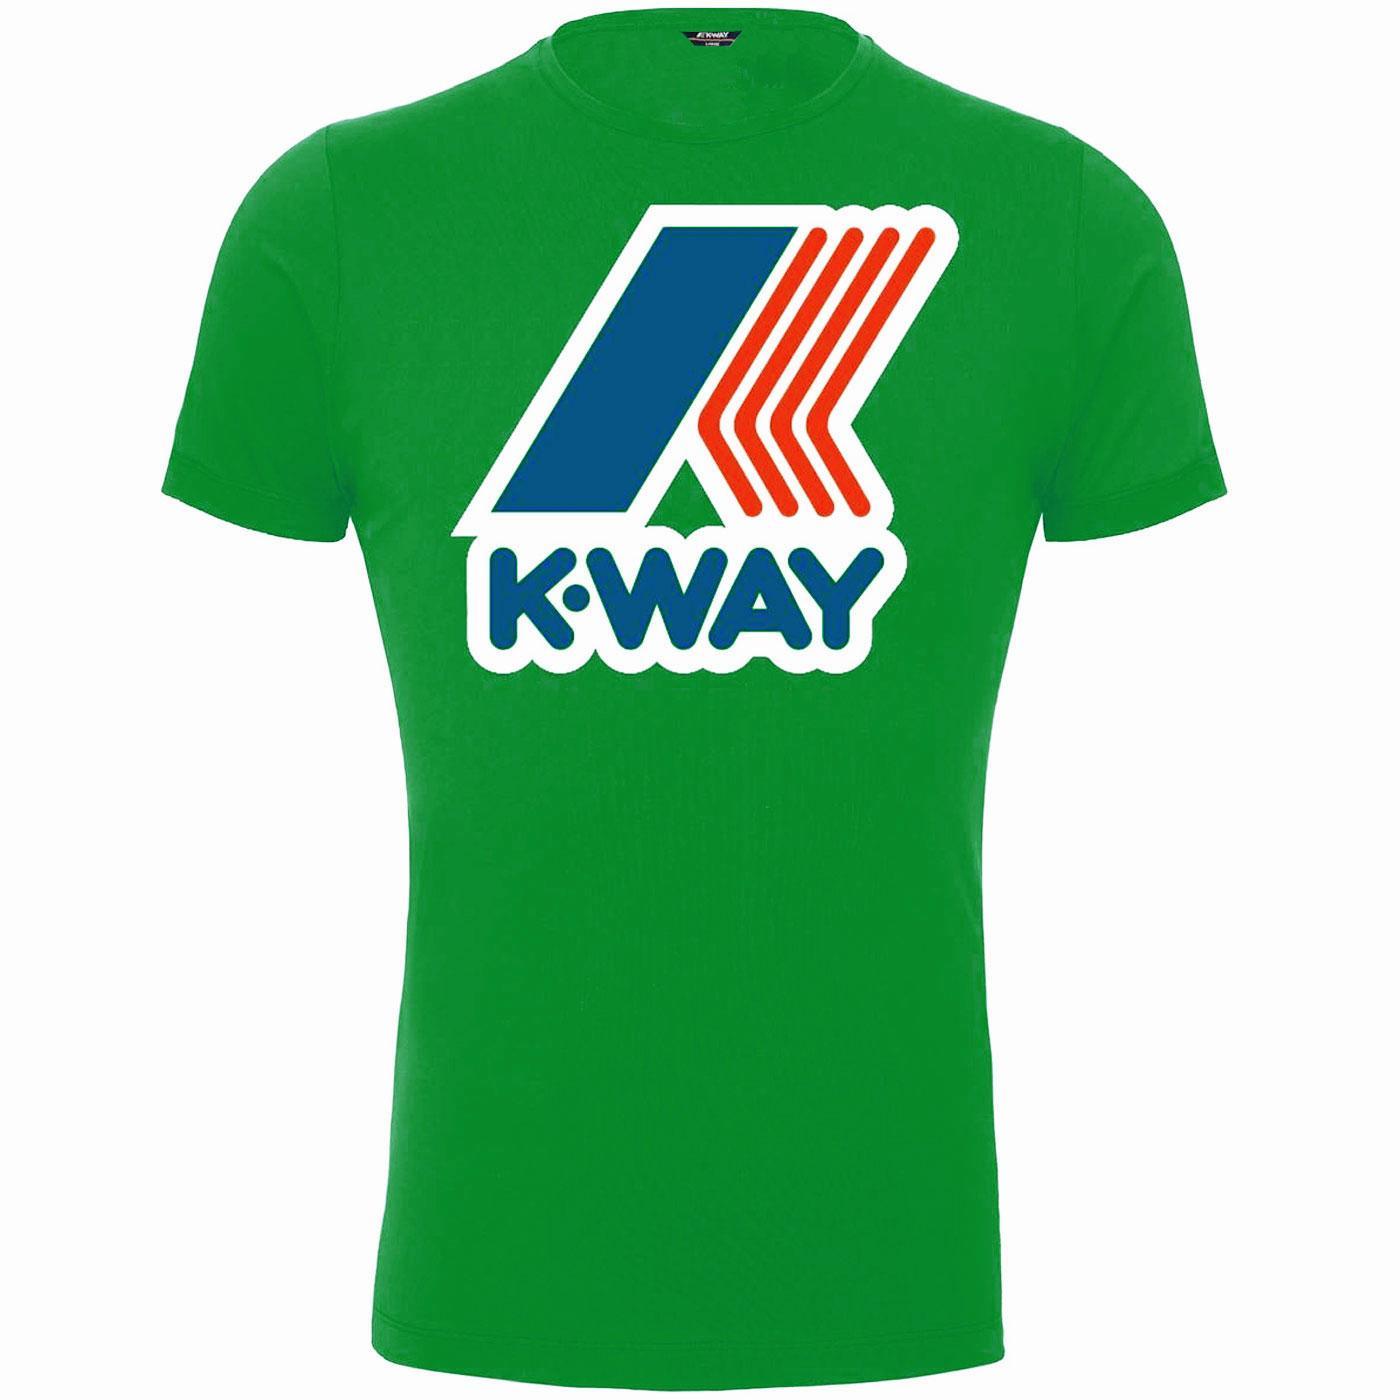 K-WAY Pete Macro Logo Retro 80s Tee (Green Cactus)